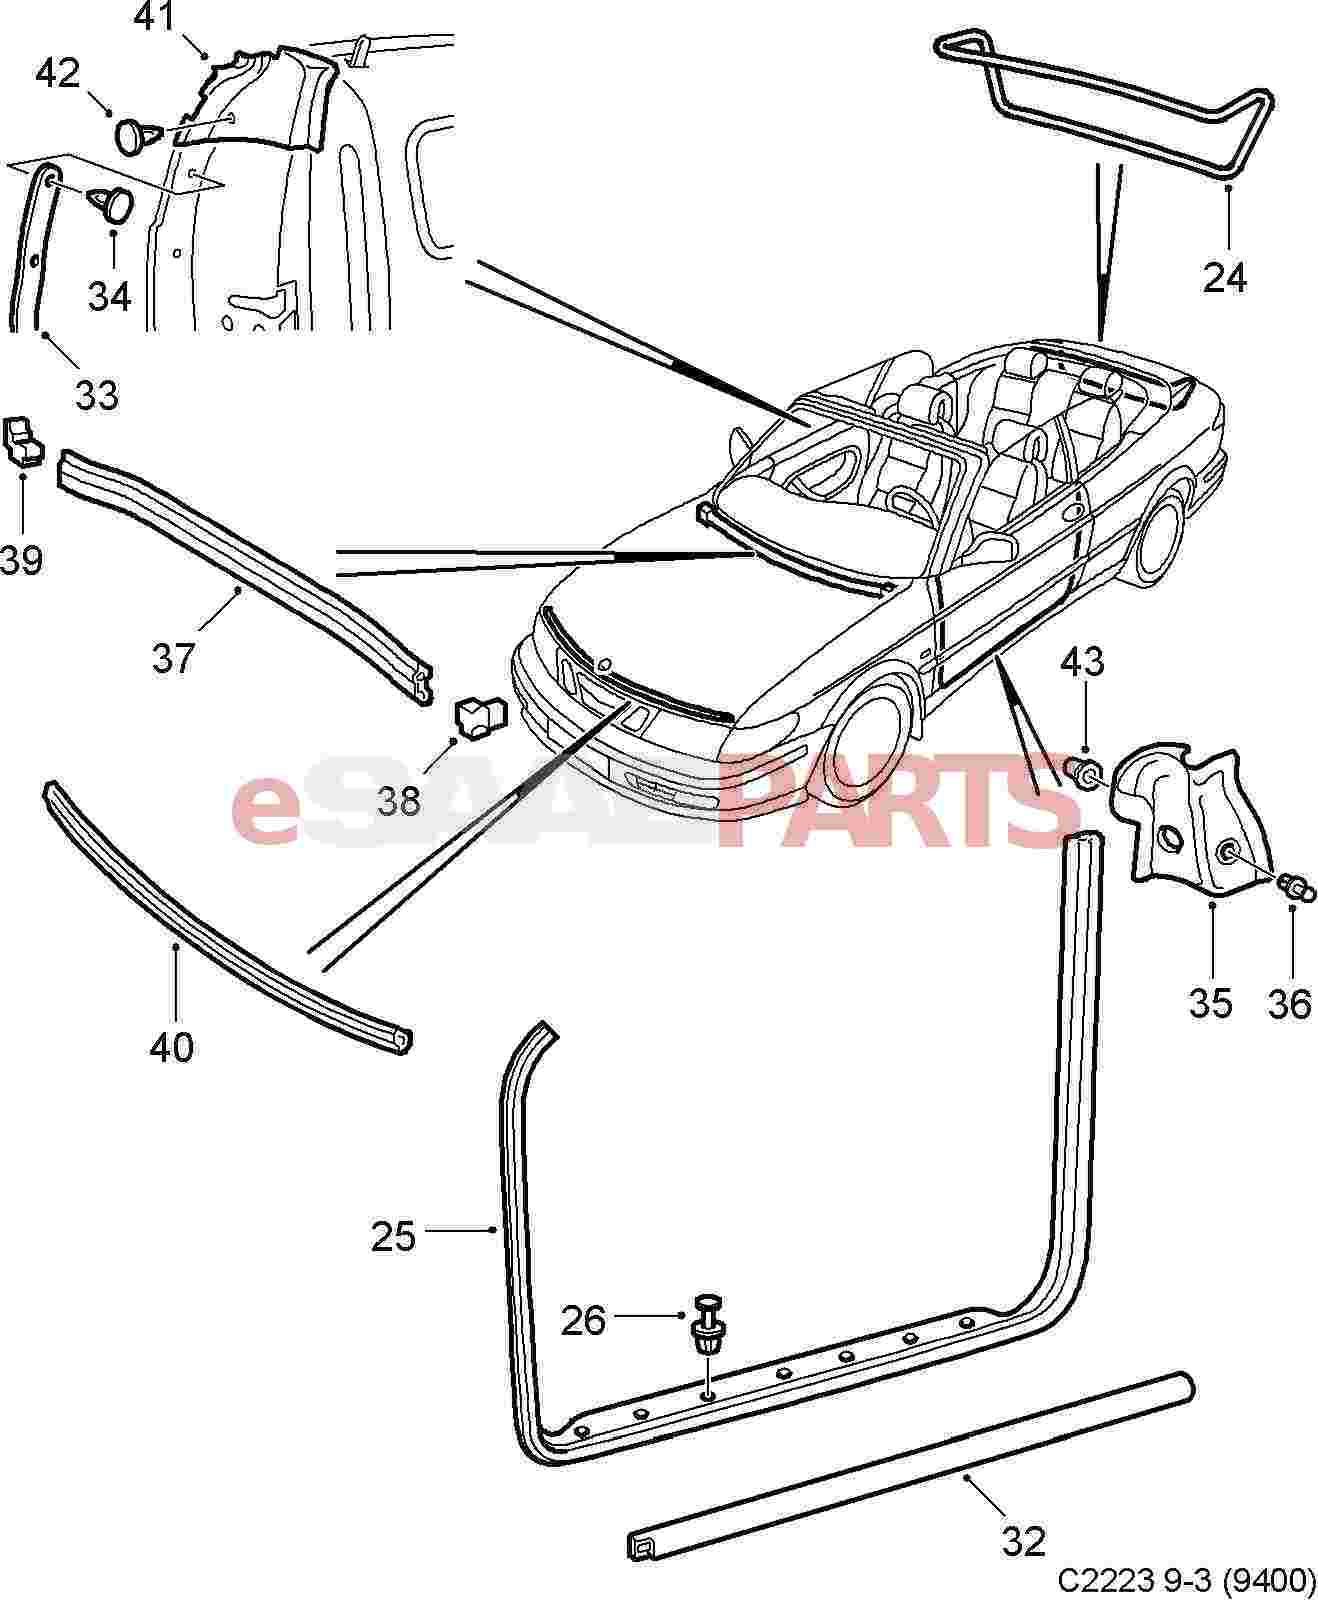 tahoe fuel pump wiring diagram get free image about wiring diagram